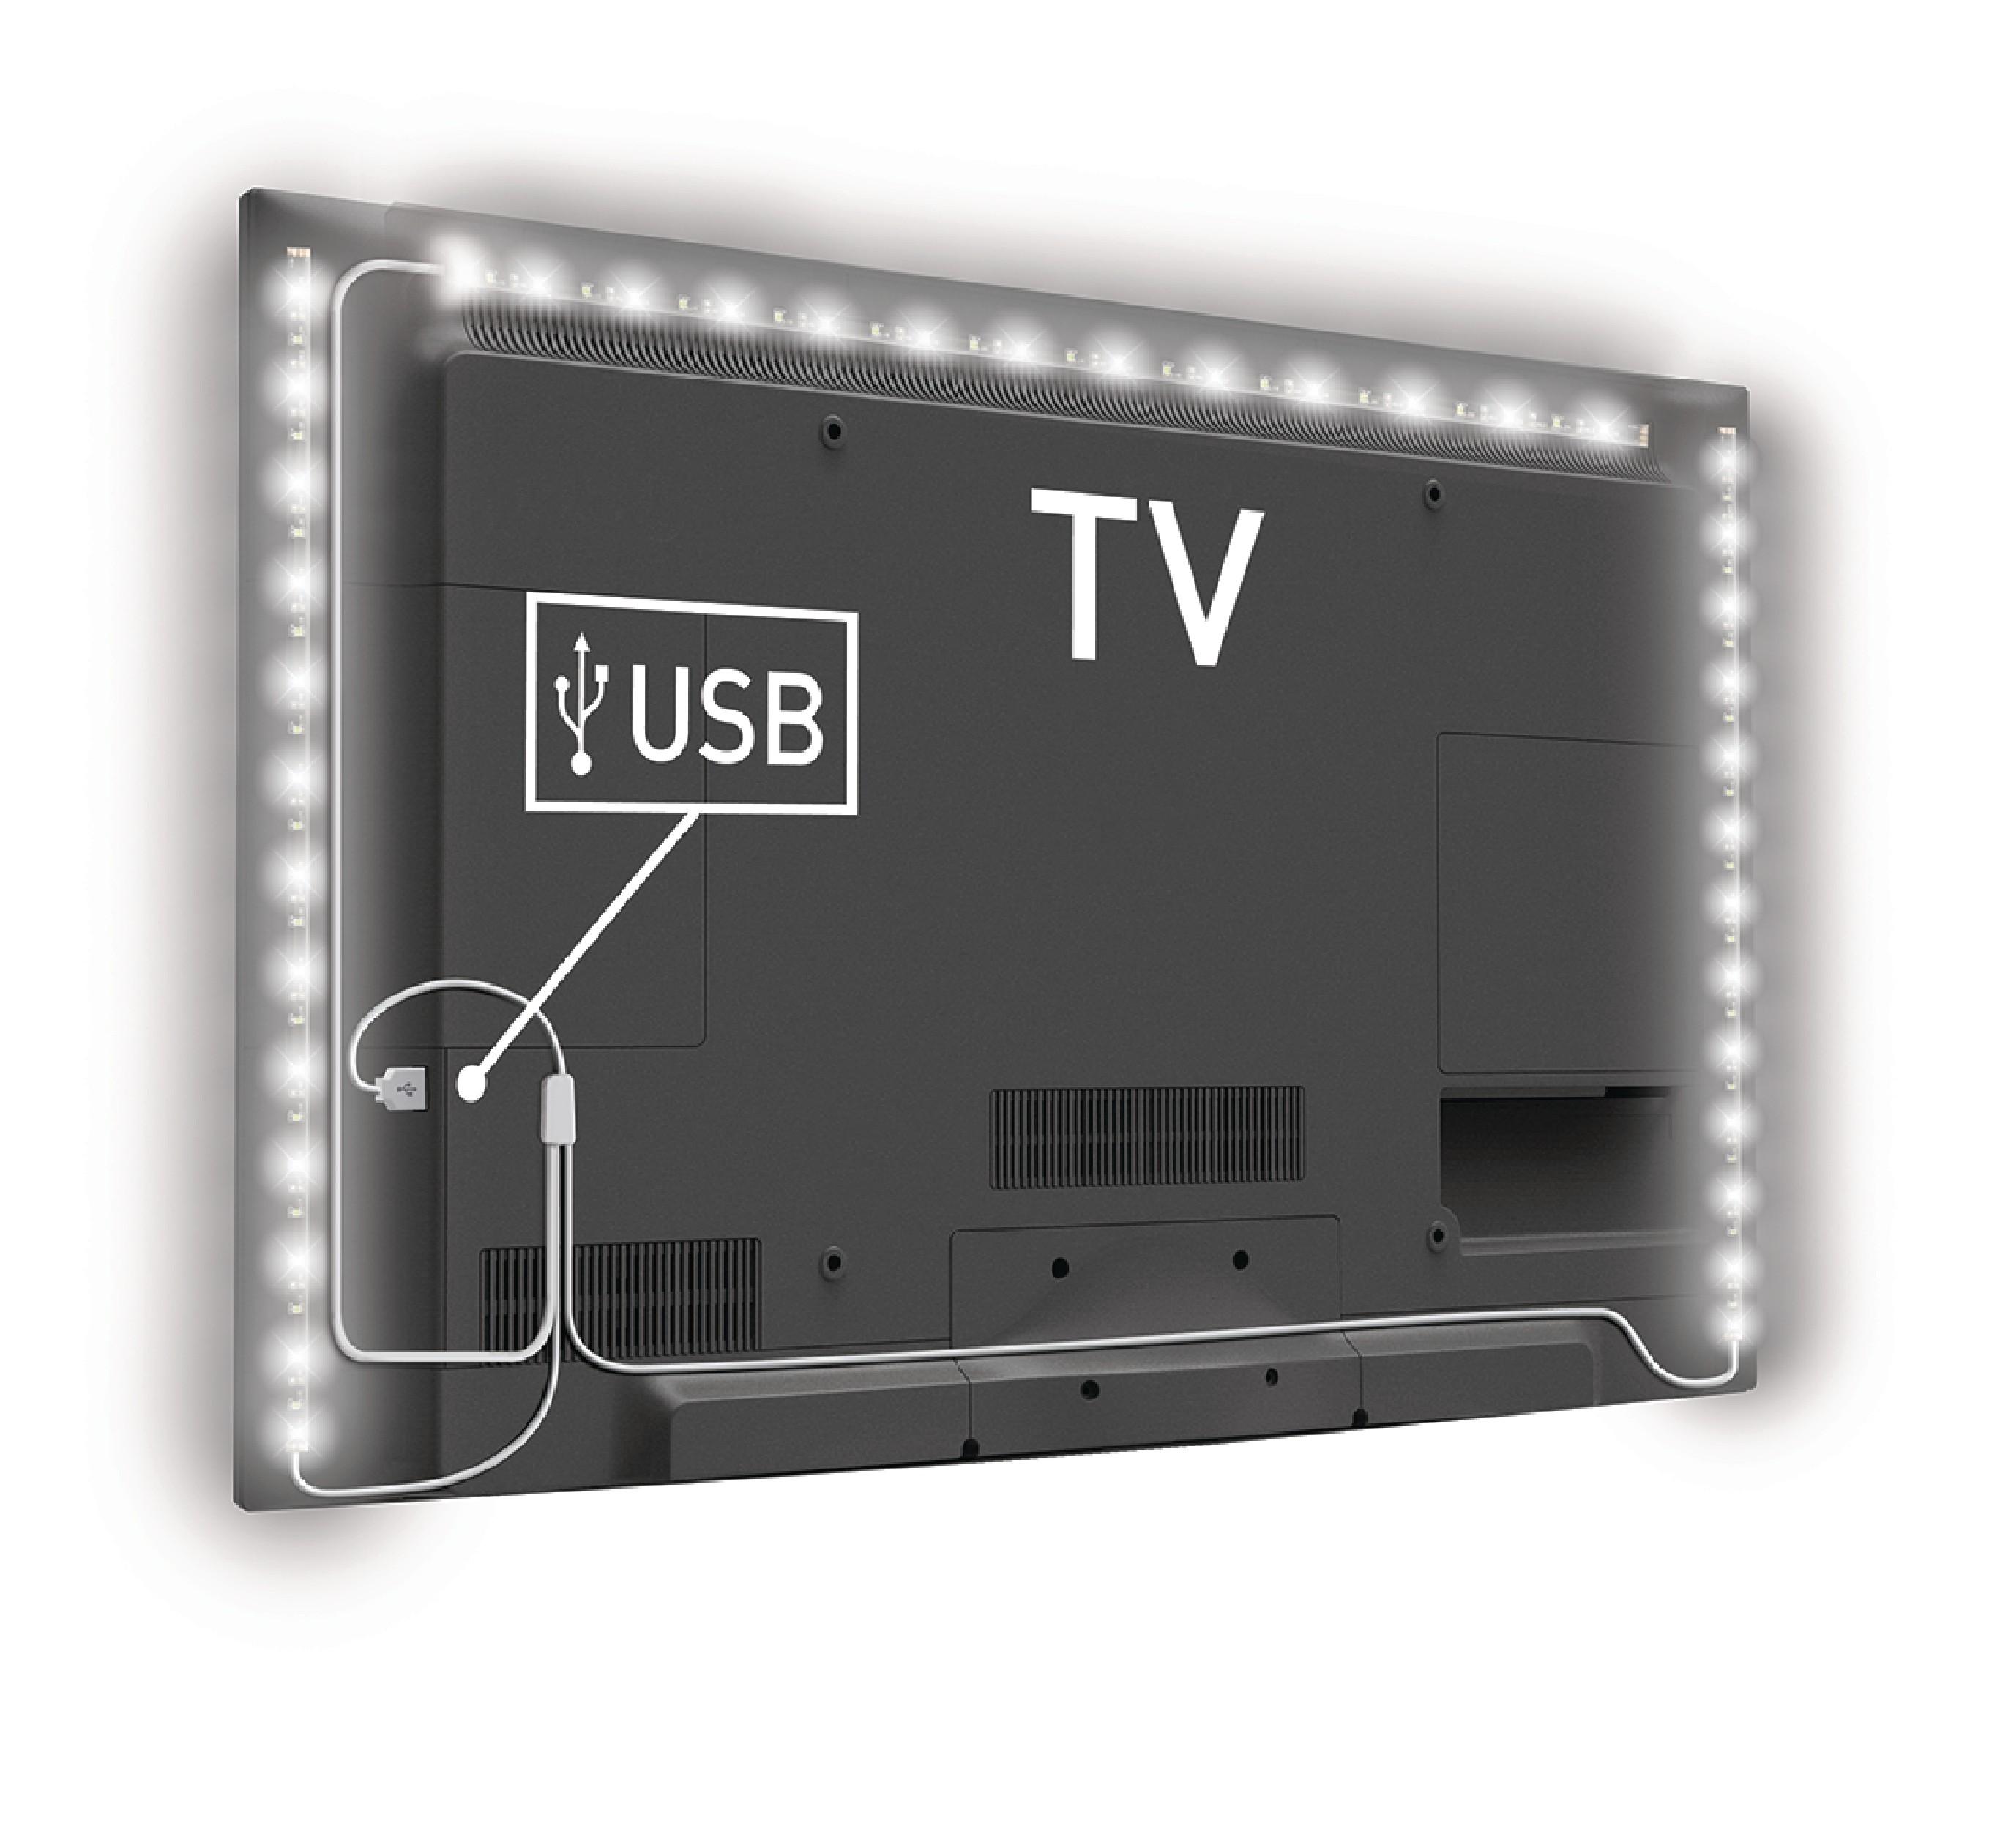 König USB LED pásek za TV, 2x 45 cm + 1x 90 cm, studená bílá König KNM-ML3WD